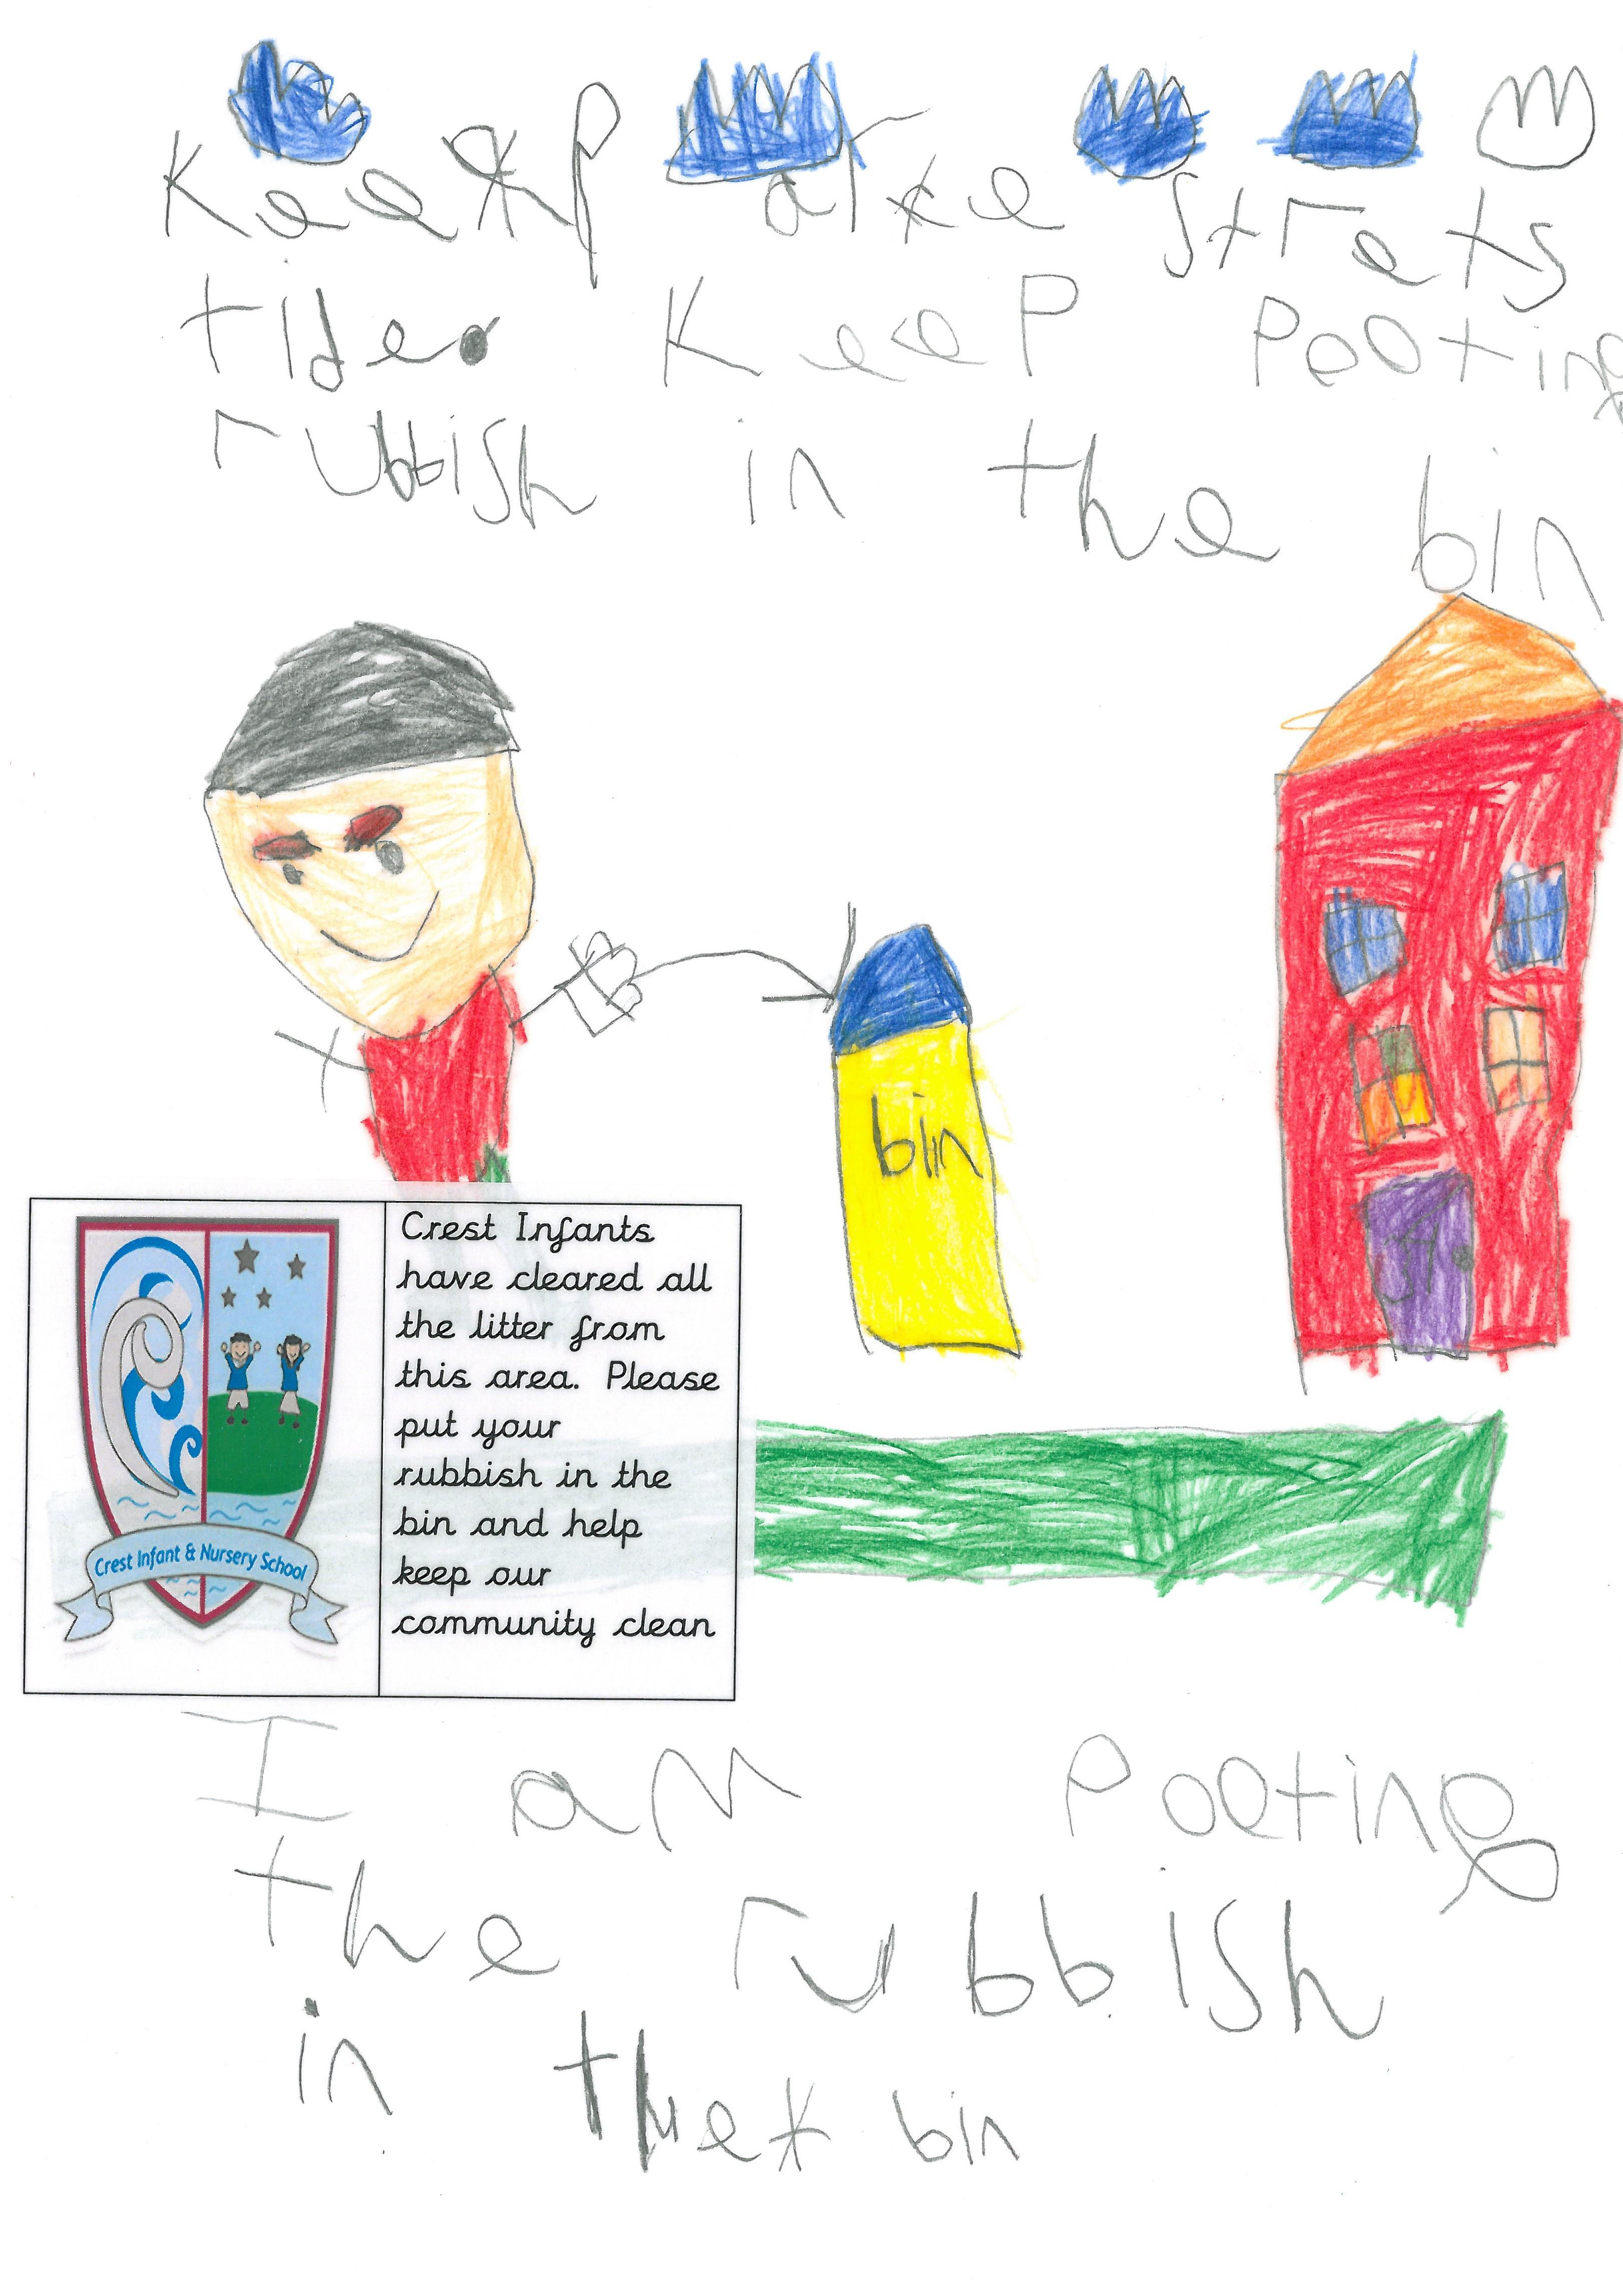 Child drawing 1 - community litter pick